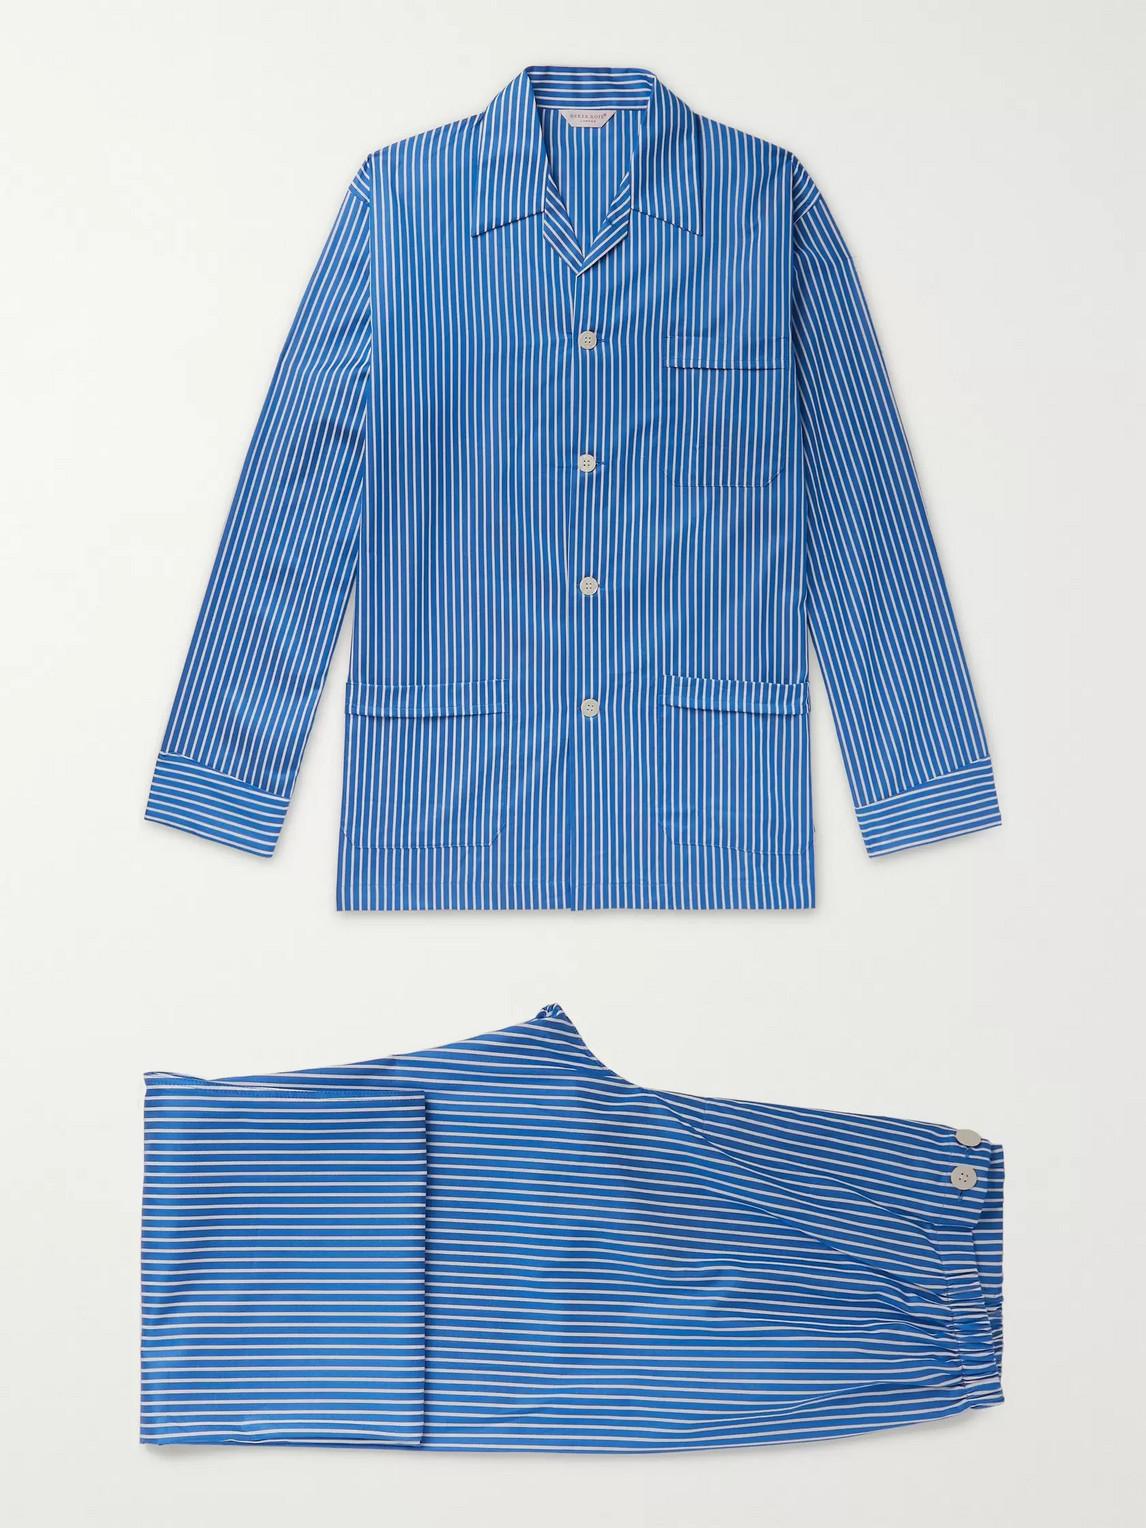 derek rose - royal 215 striped cotton-poplin pyjama set - blue - s - men